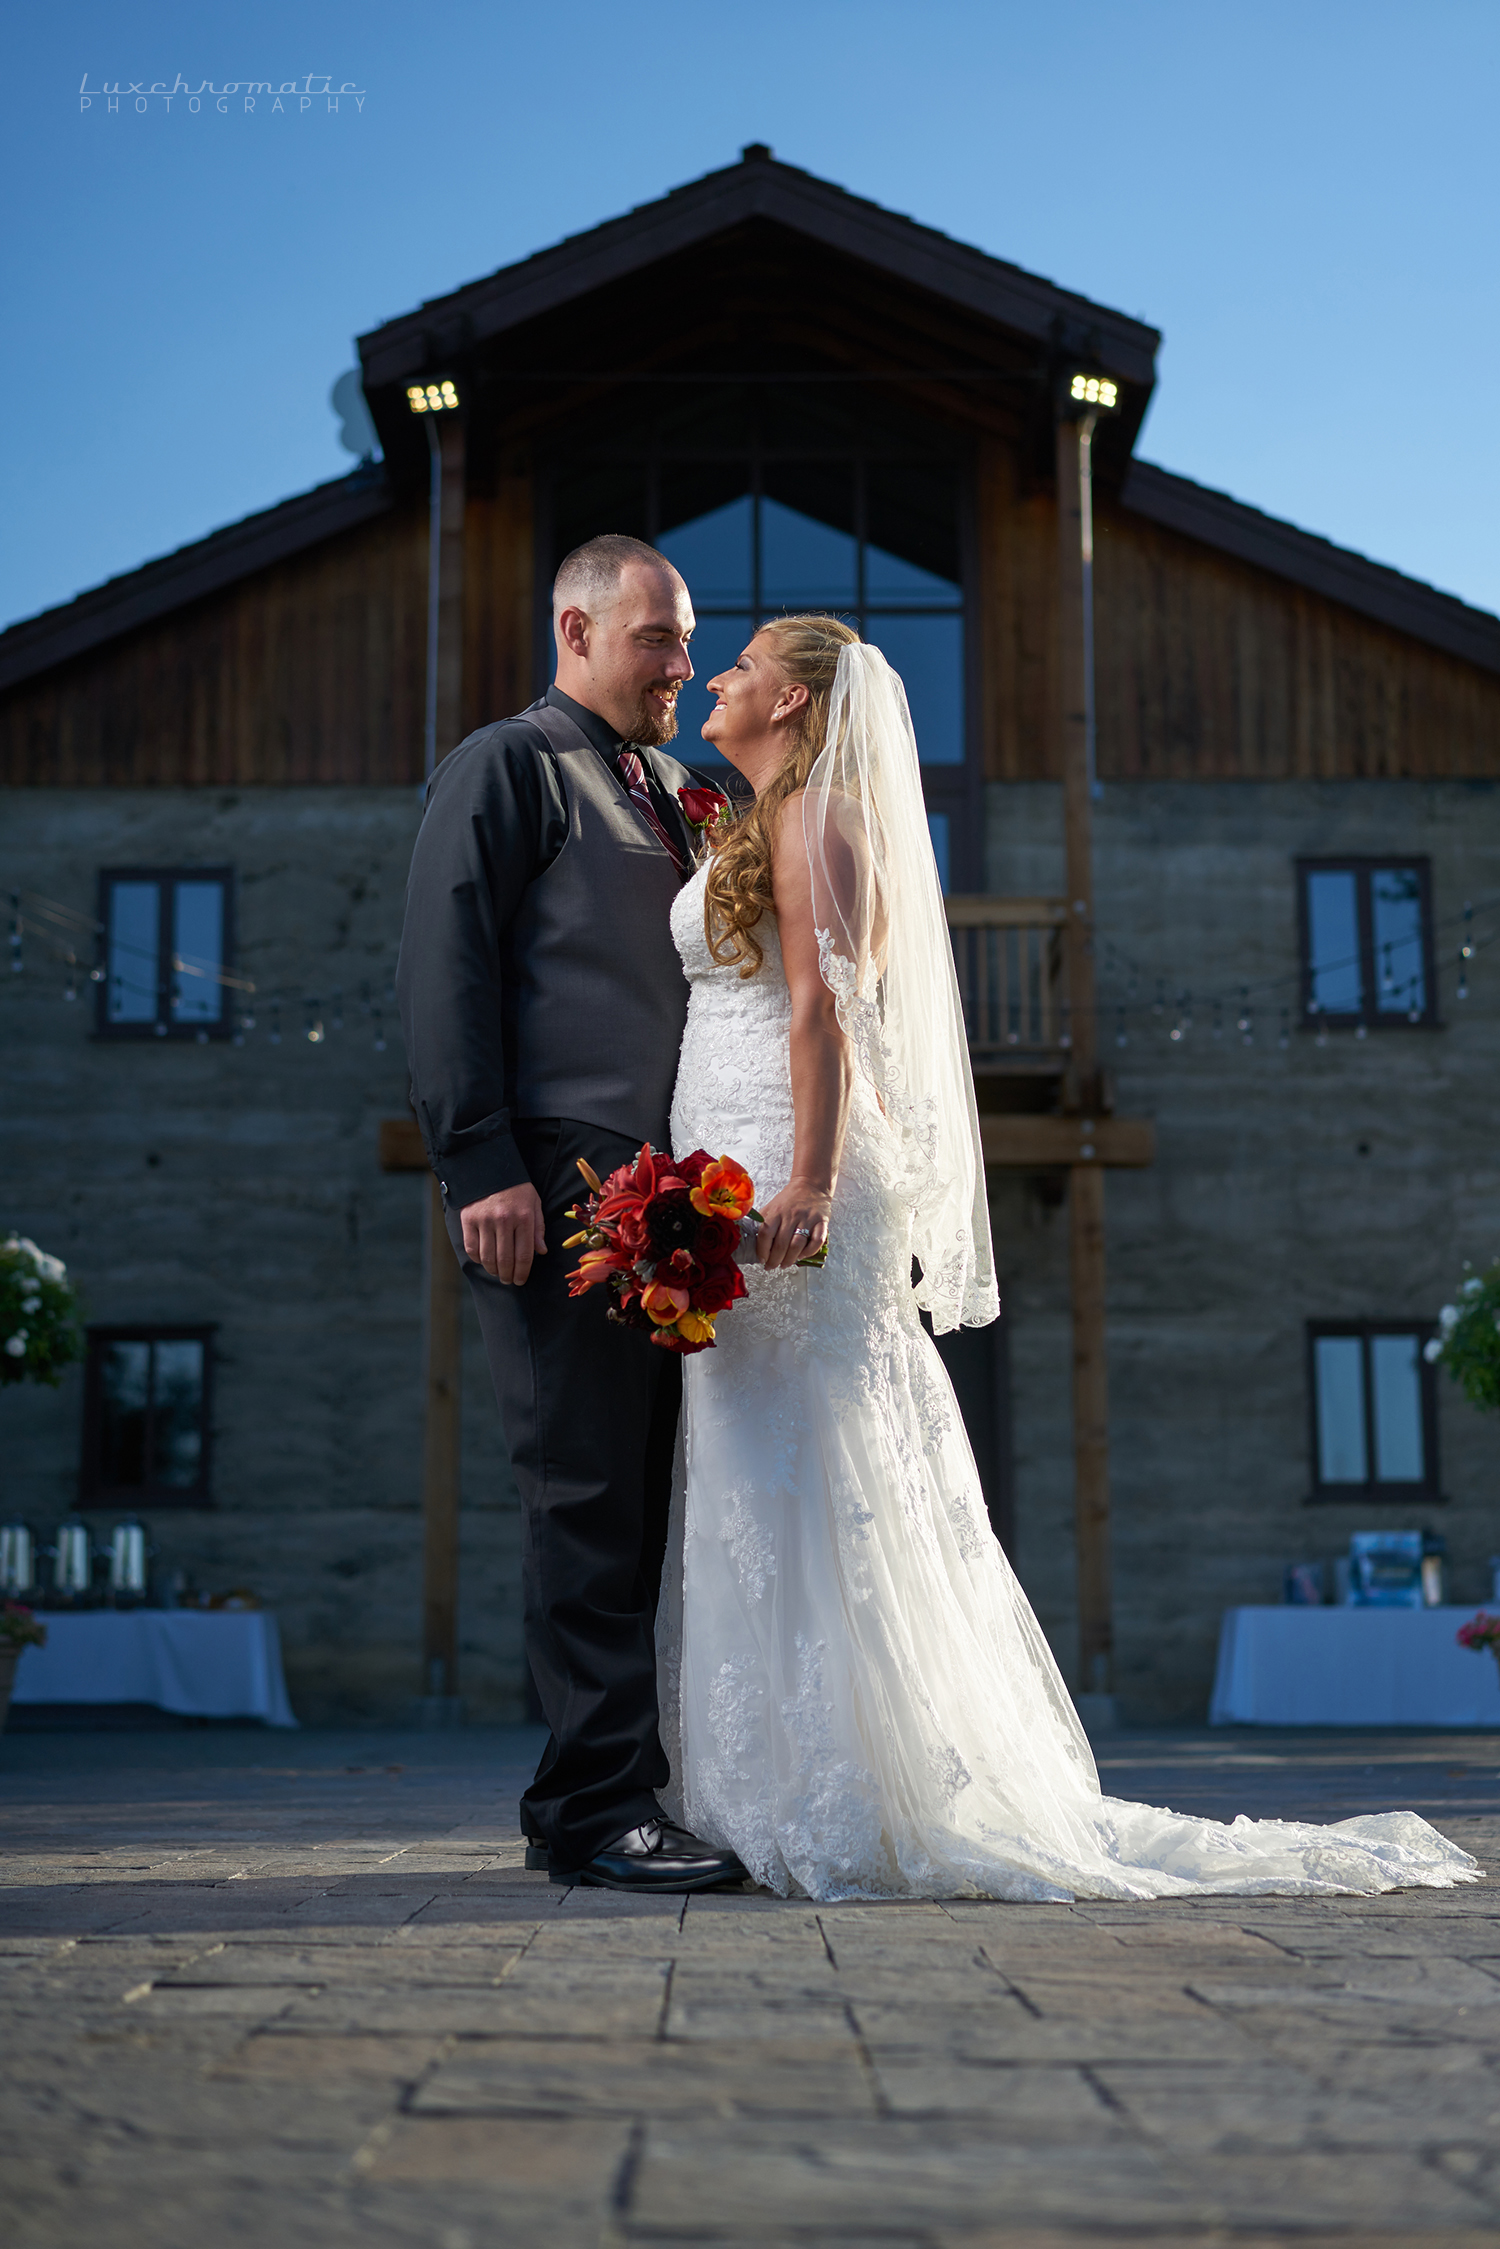 081217_Rachel_Chris_a0583-weddingdress-bride-weddingphotography-weddingphotographer-bridal-groom-wedding-engagementring-proposal-brides-diamondring-sonyalpha-sony-sonya9-sonya7rii-sanfrancisco-sf-bayarea-photographer-profoto-murrietas-well.jpg